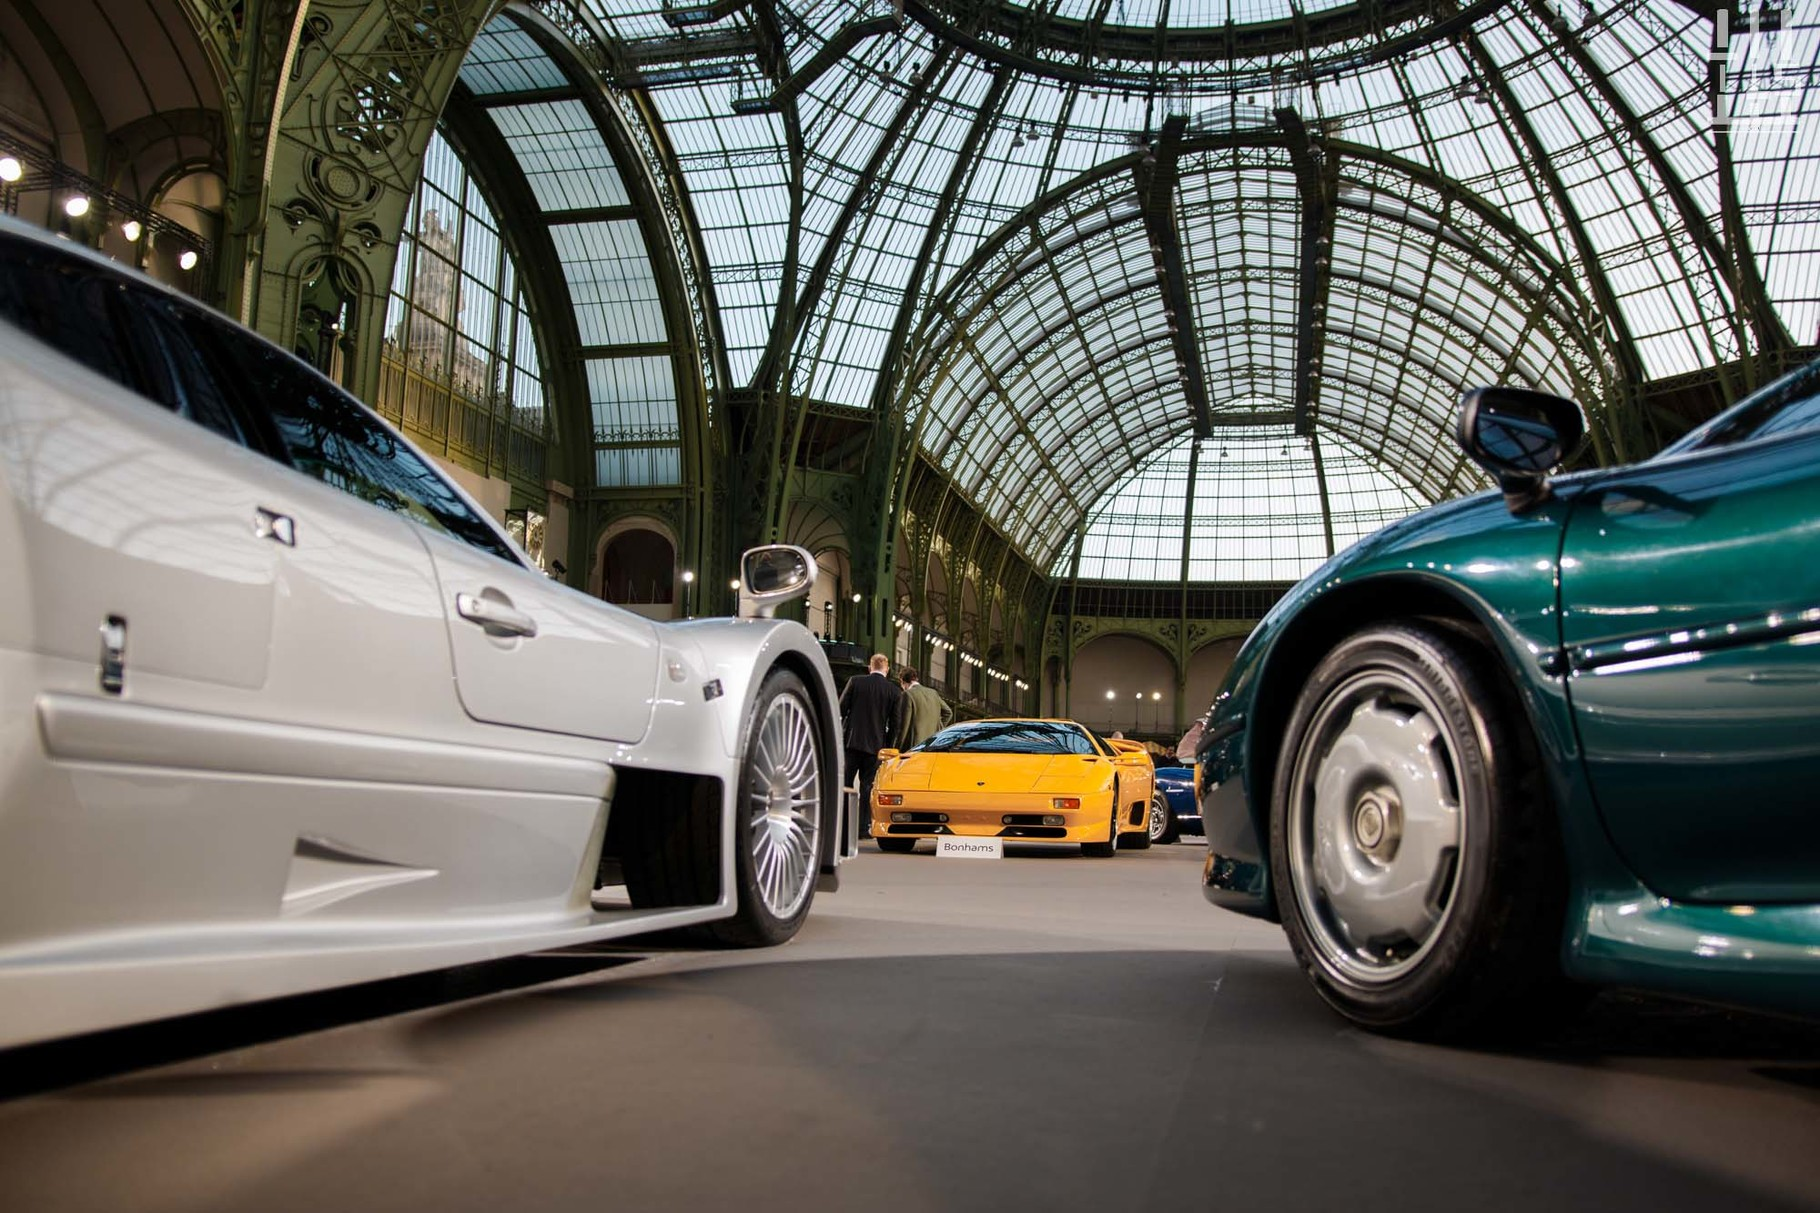 Mercedes-Benz CLK GTR Coupé, invendue.